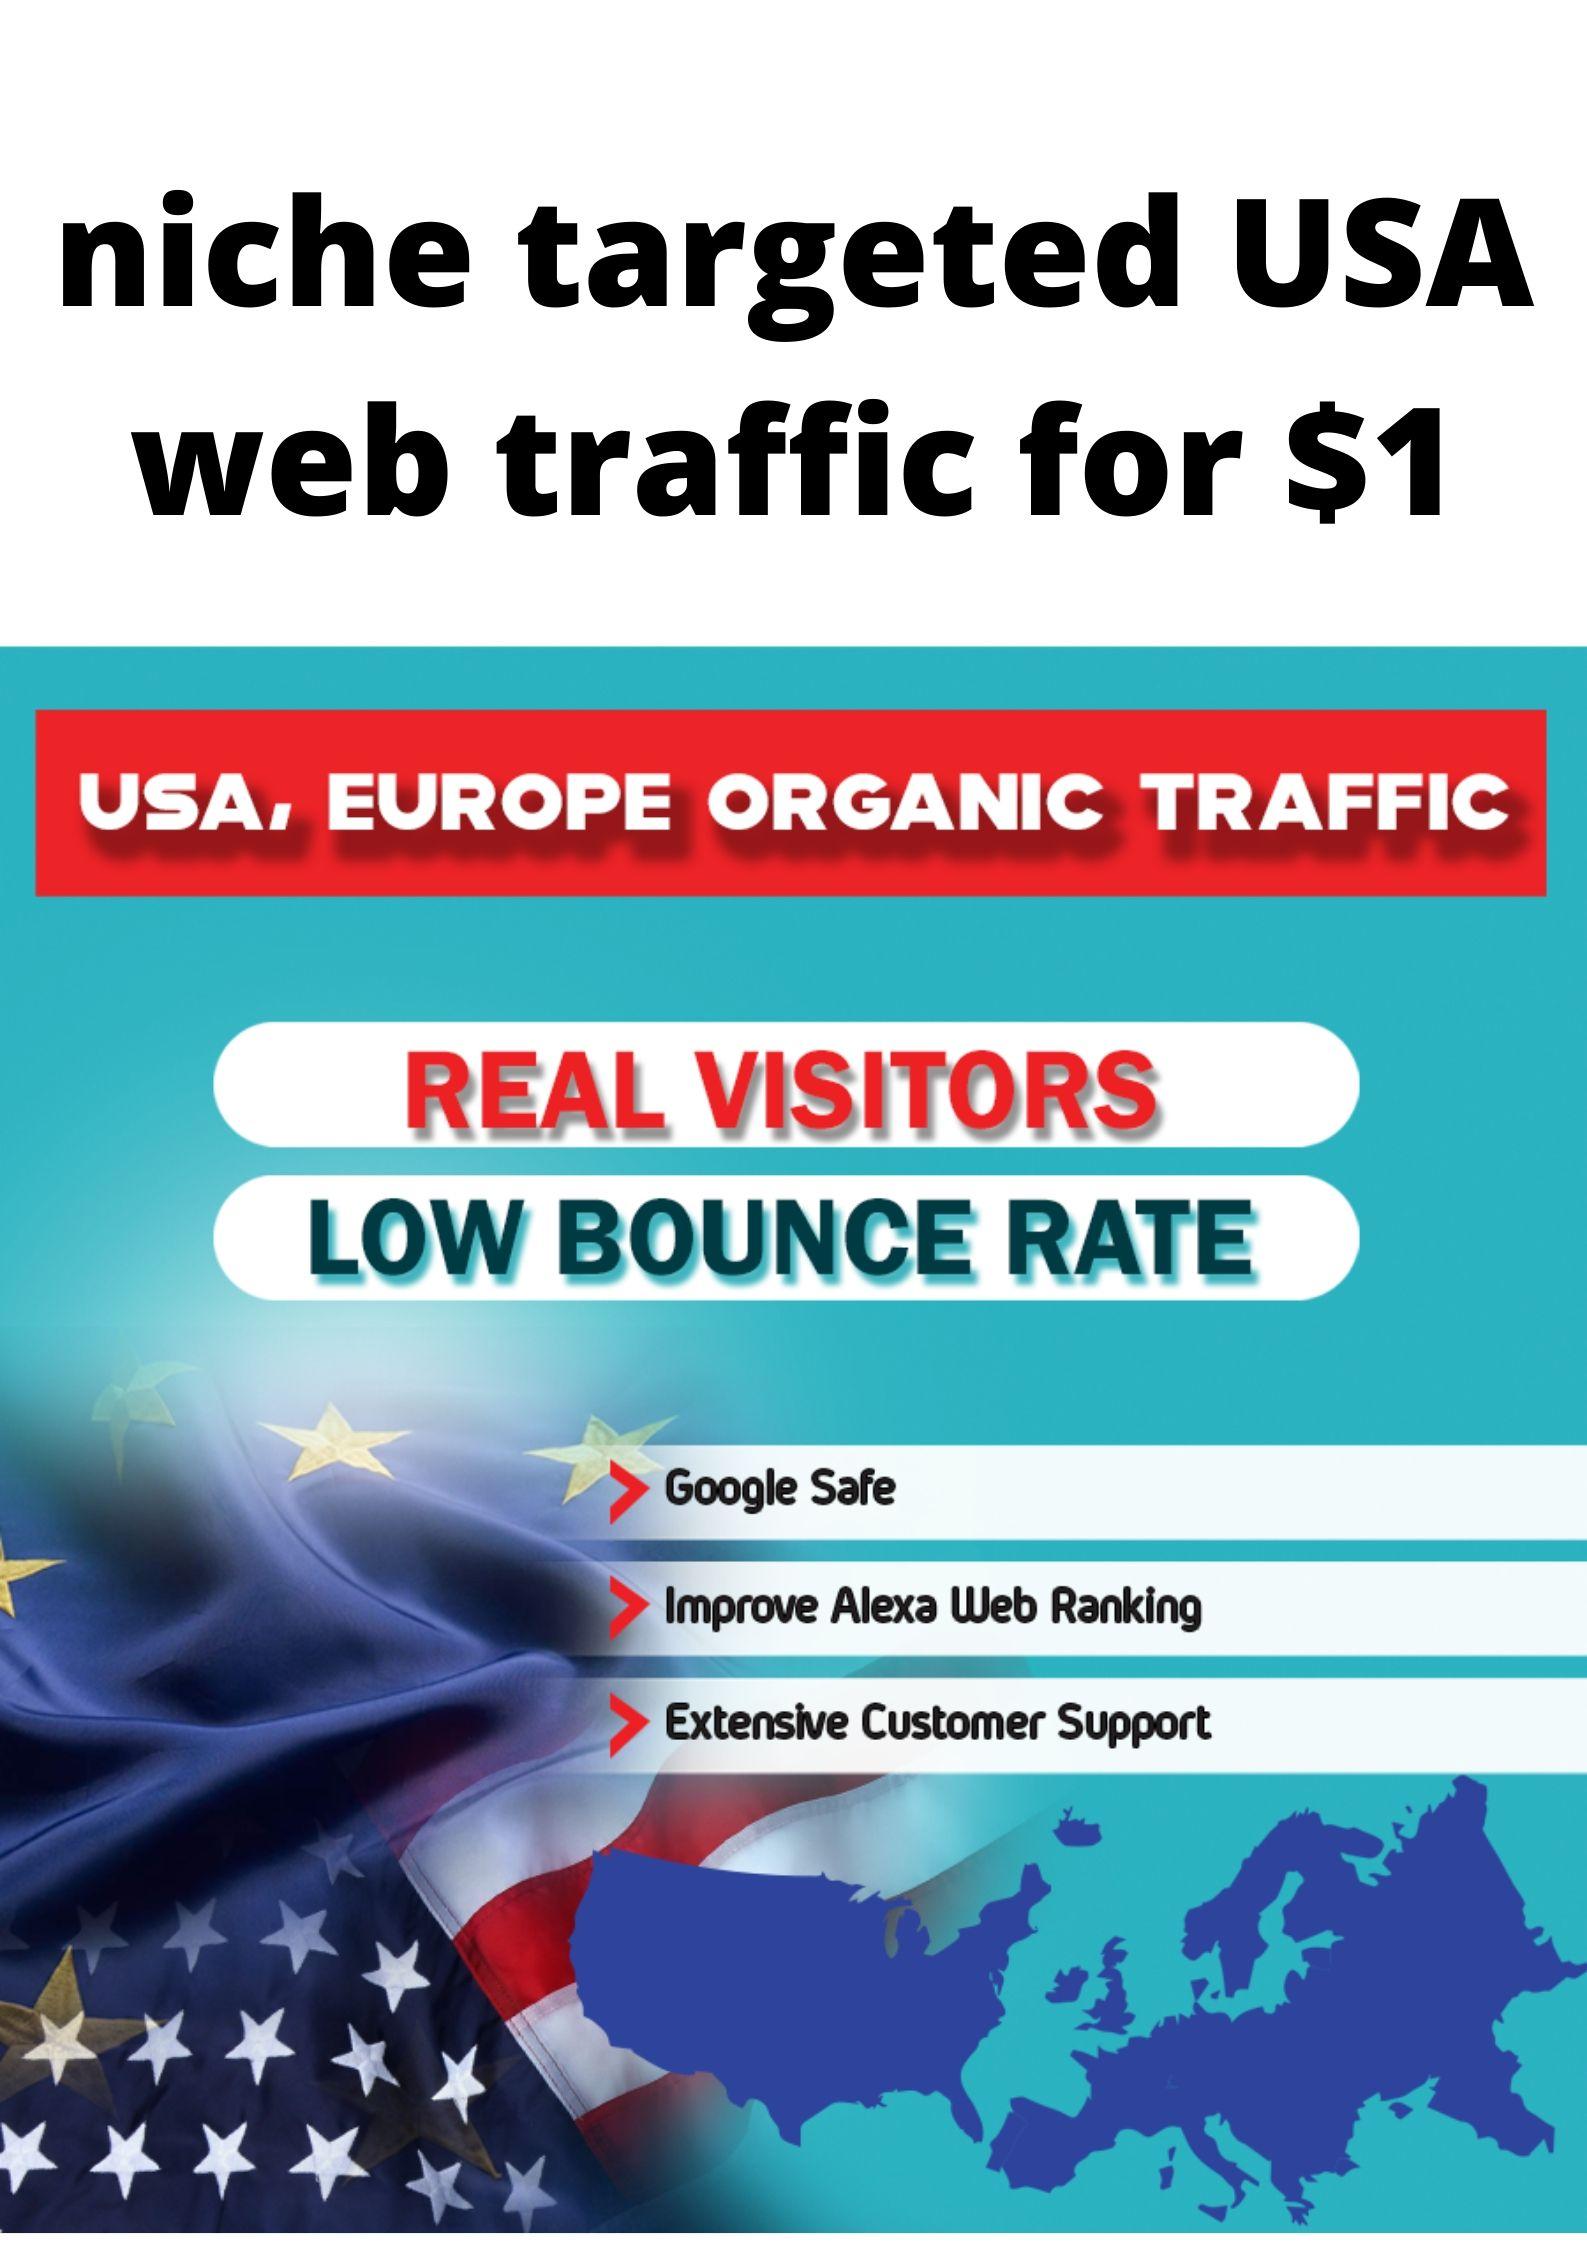 niche targeted web traffic in USA